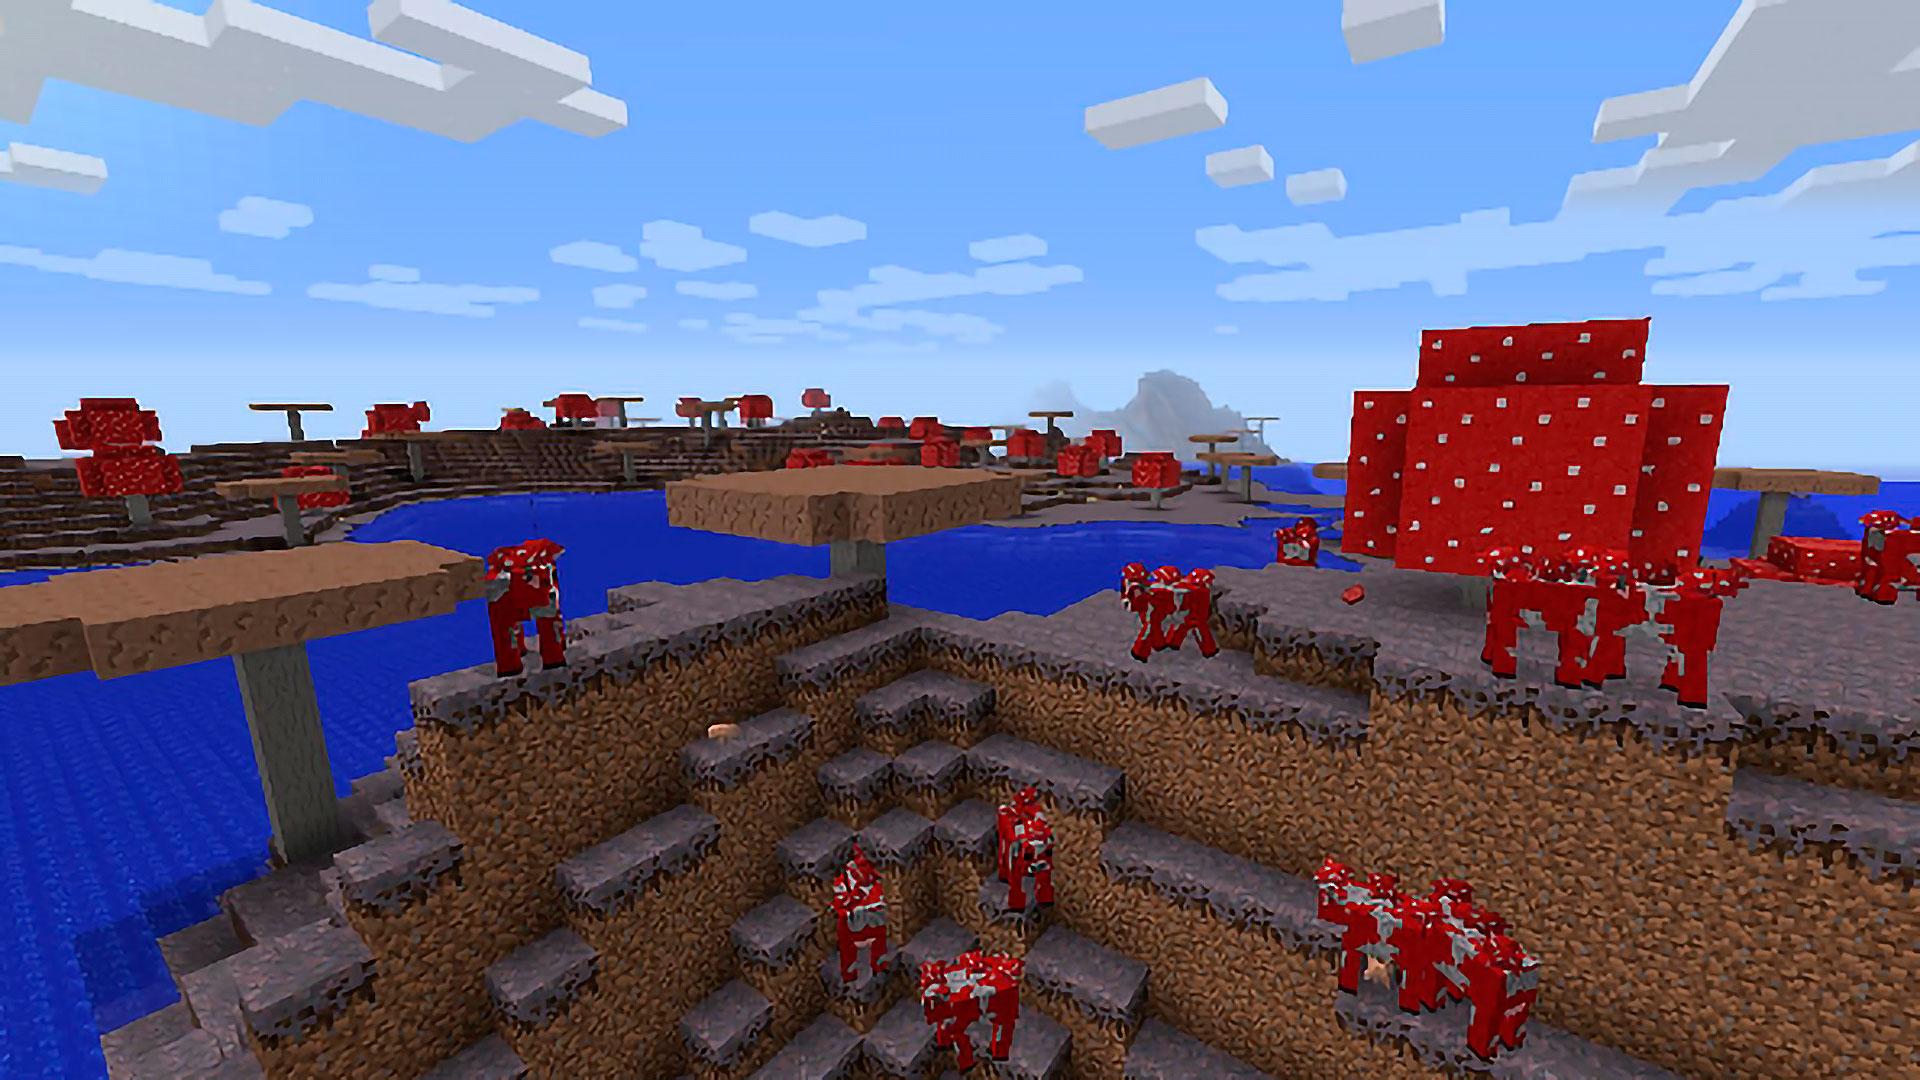 Minecraft free download for pc creative mode | Minecraft APK 1 2 6 2